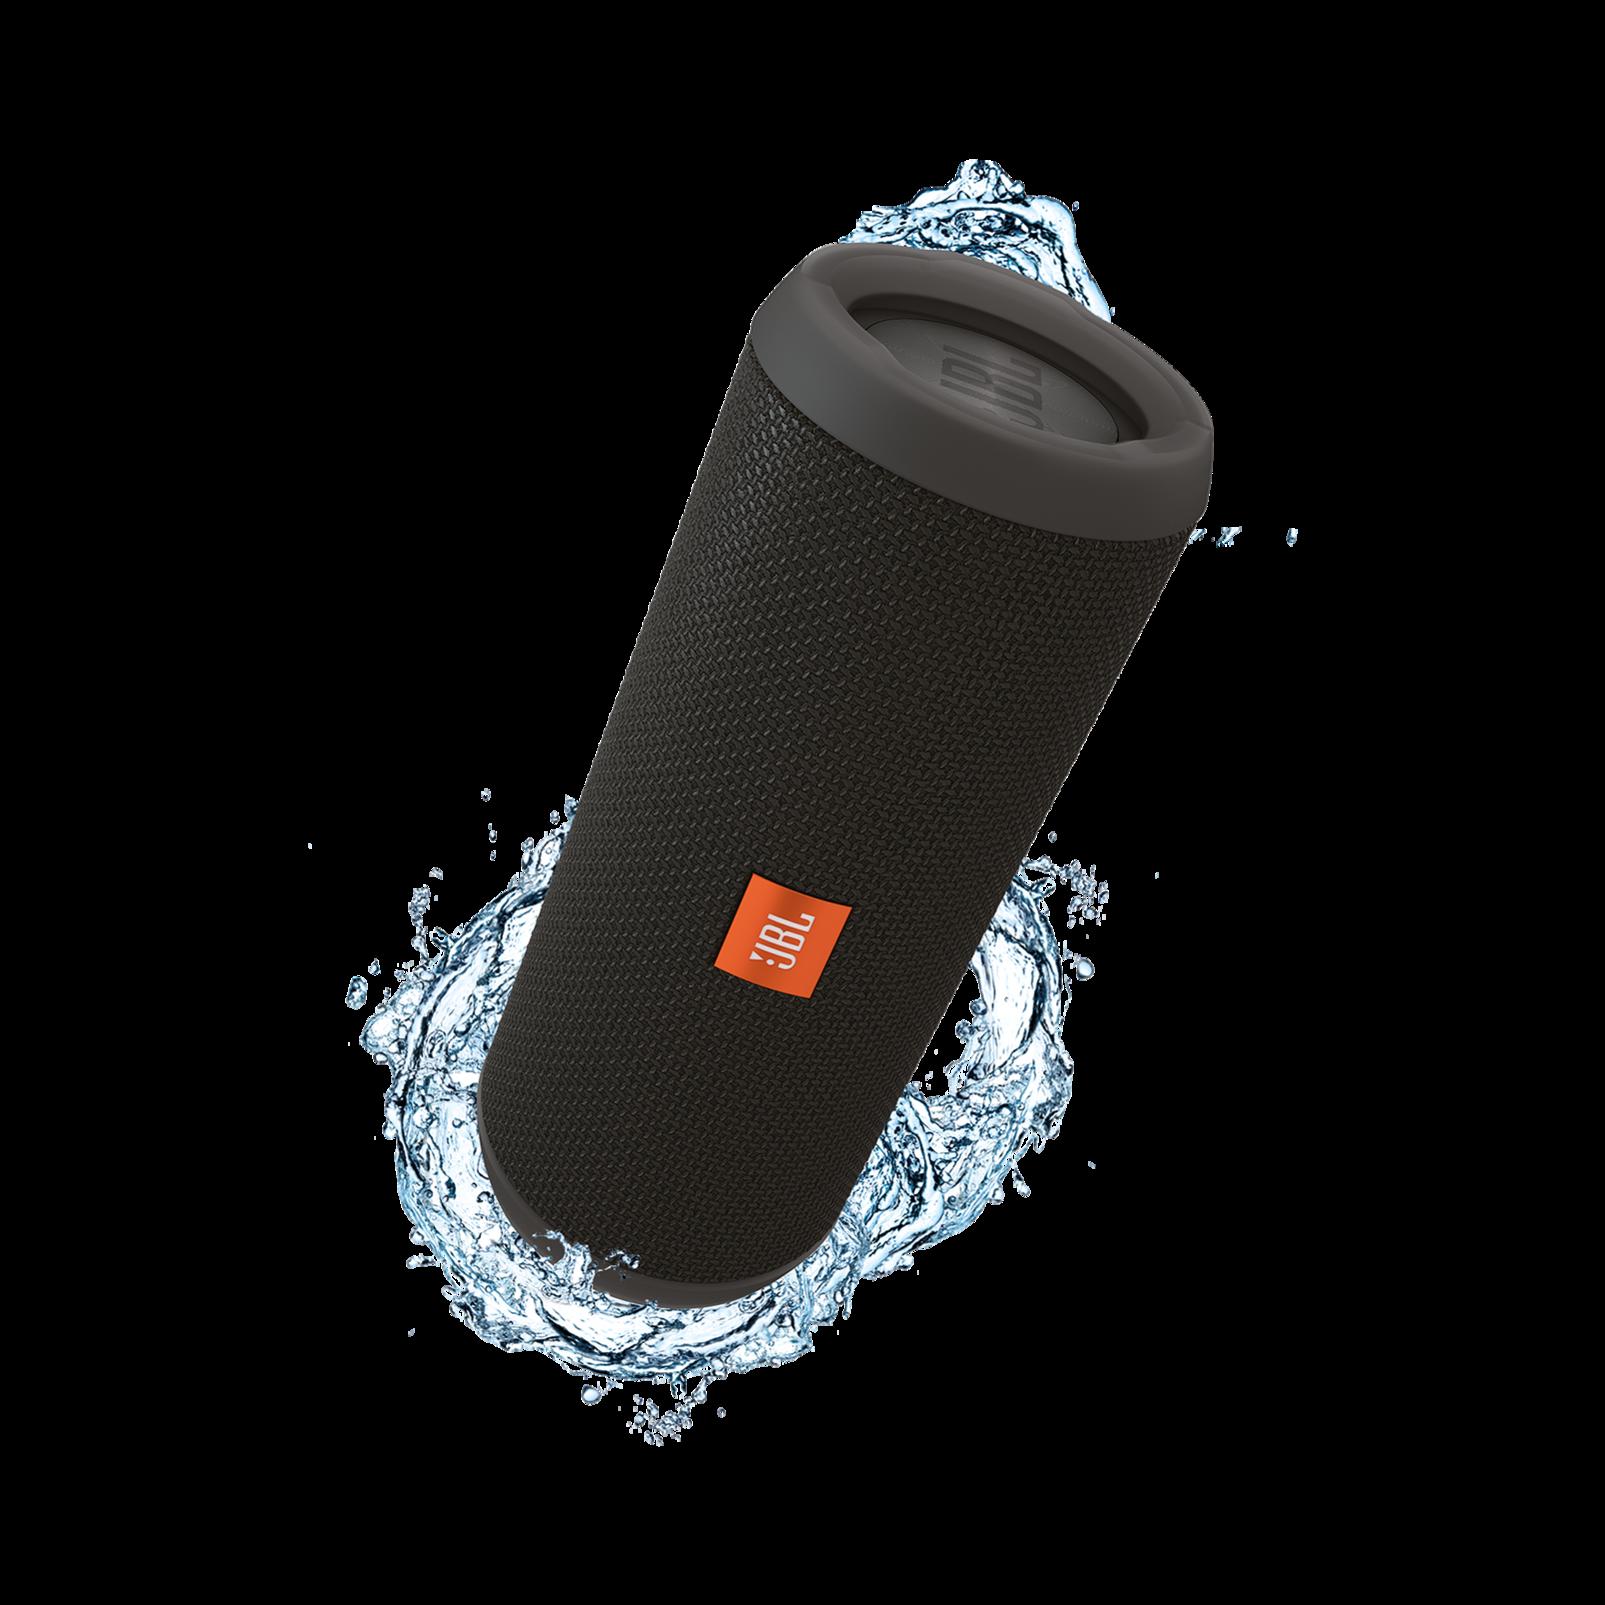 JBL Flip 3 - Black - Splashproof portable Bluetooth speaker with powerful sound and speakerphone technology - Hero